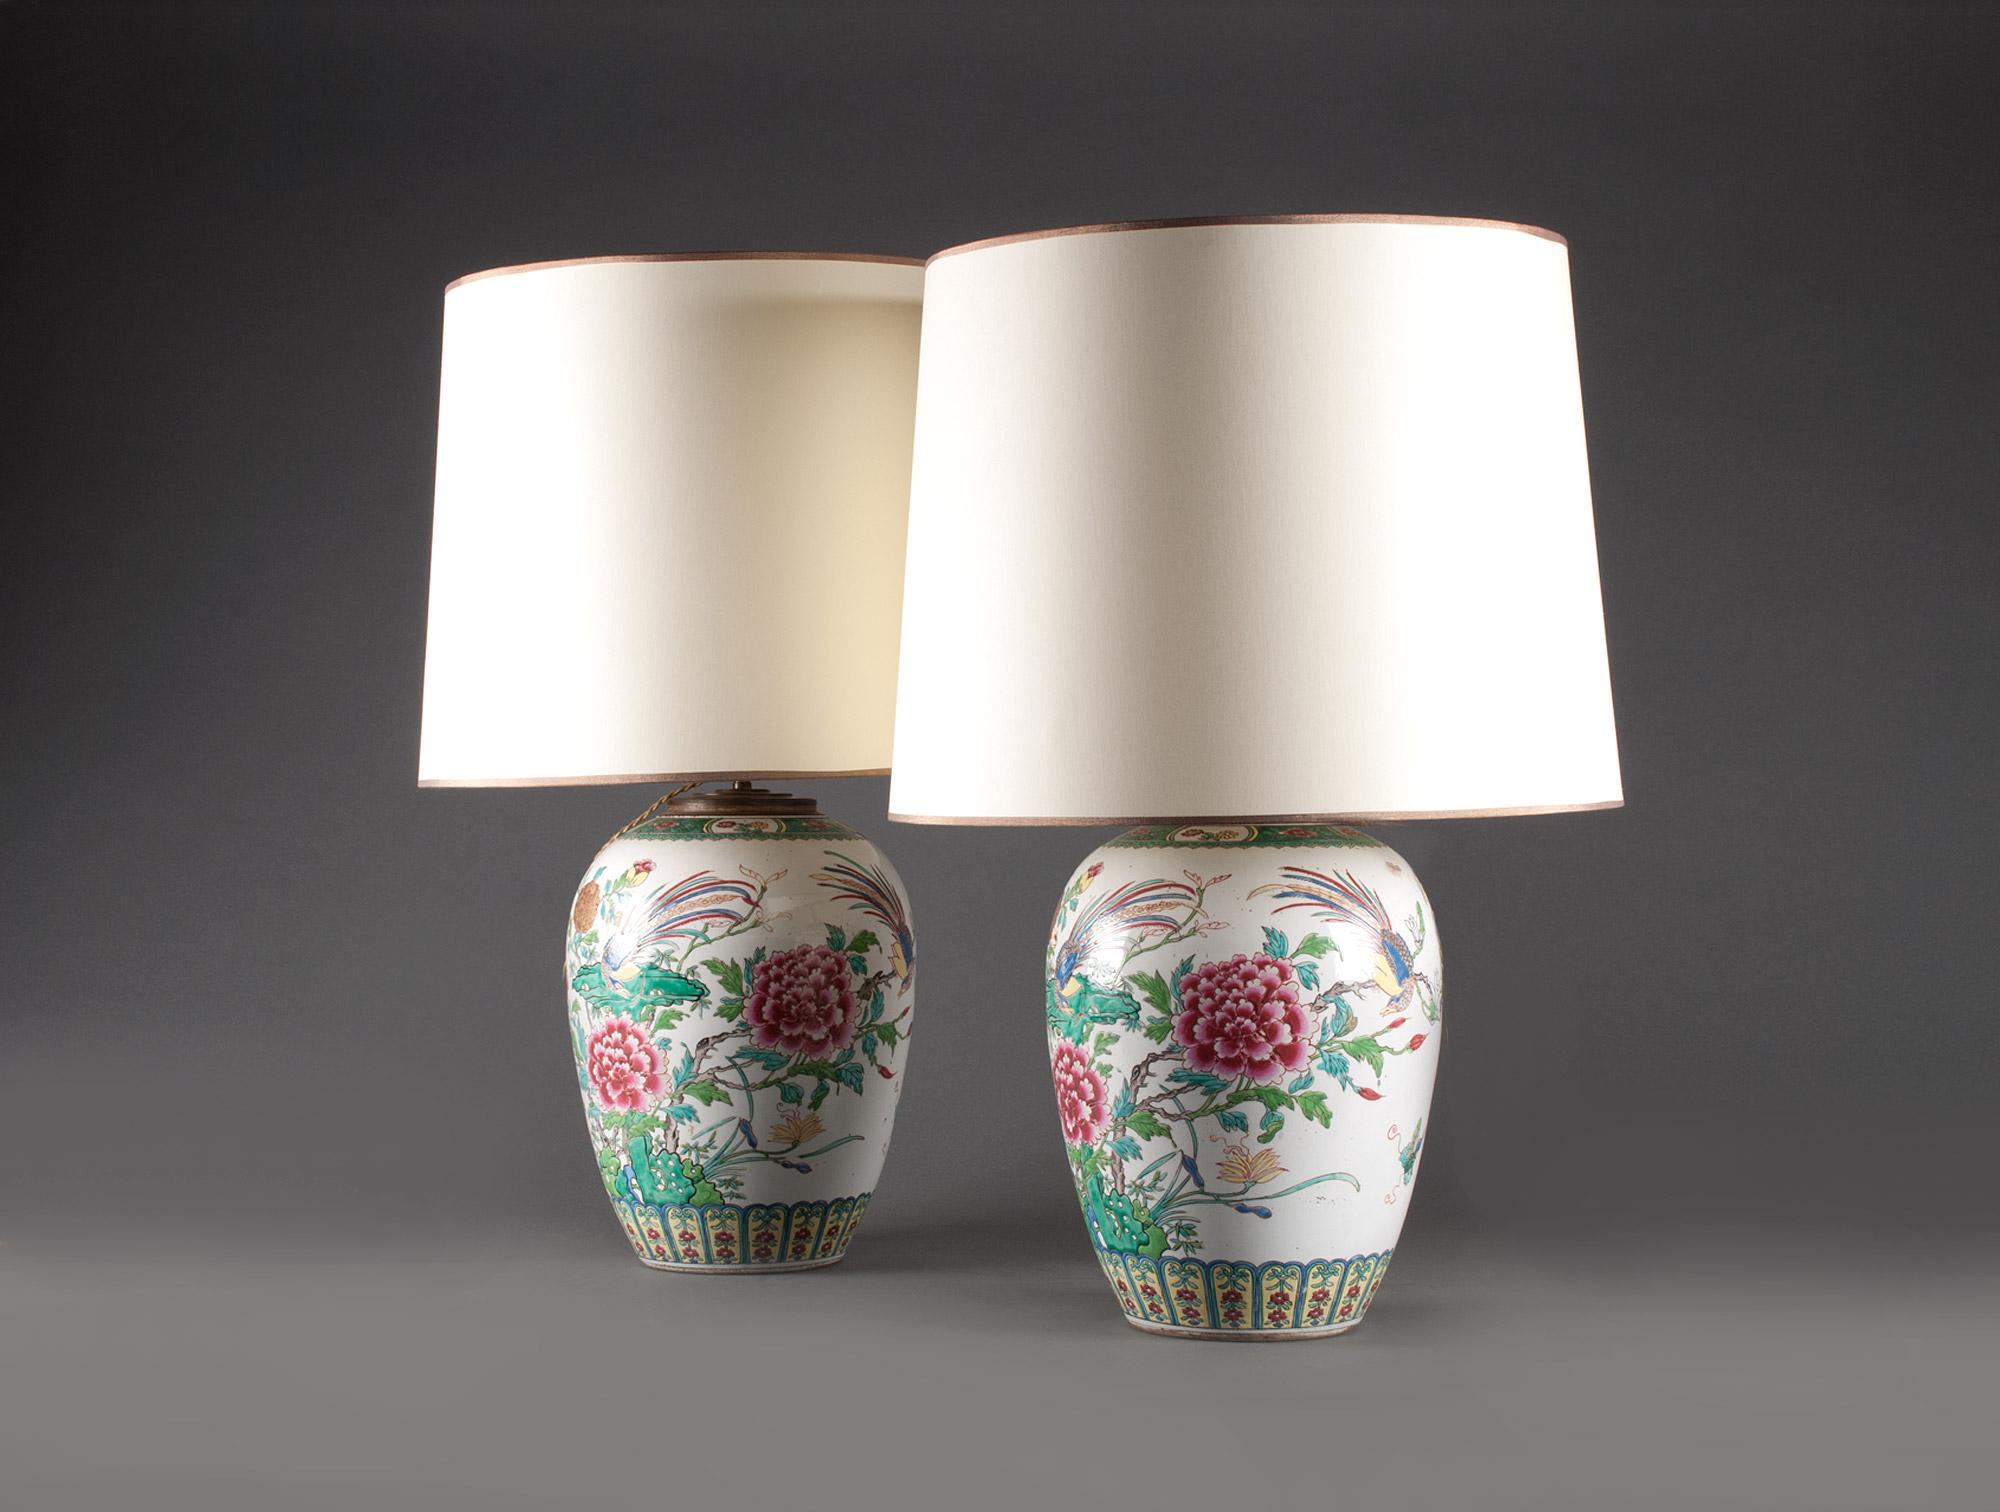 lampes chinoises en porcelaine soubrier louer luminaires. Black Bedroom Furniture Sets. Home Design Ideas